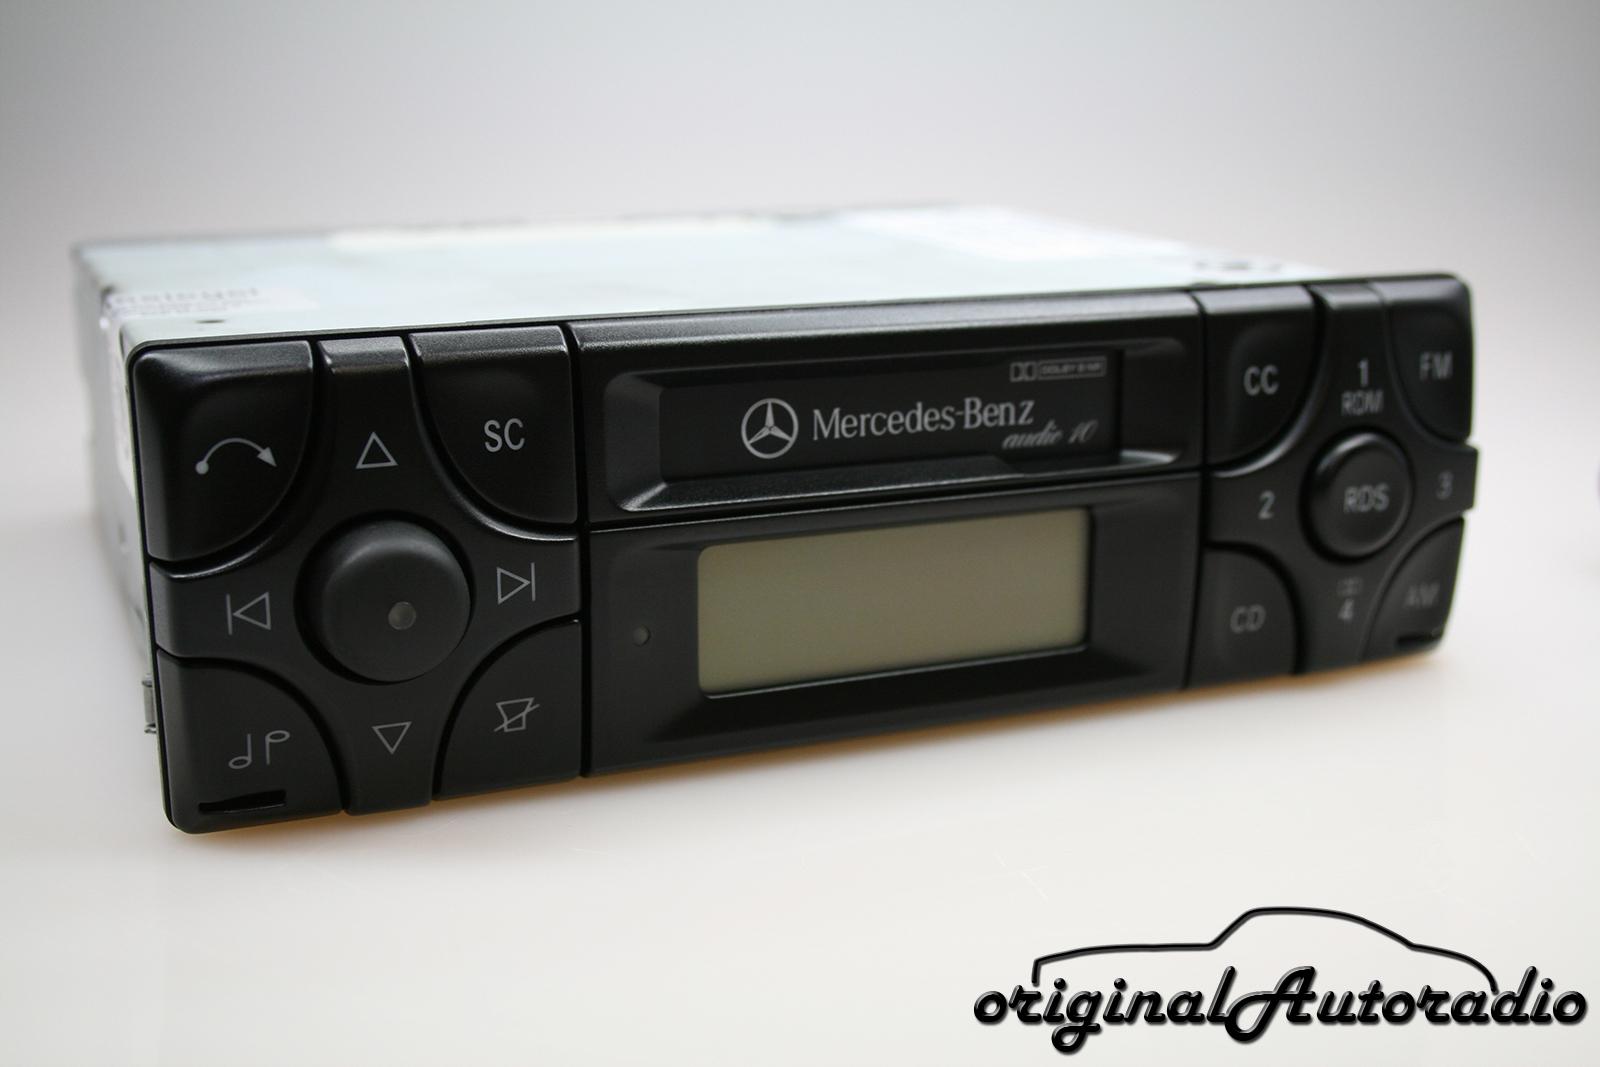 original mercedes audio 10 be3100 cc rds. Black Bedroom Furniture Sets. Home Design Ideas